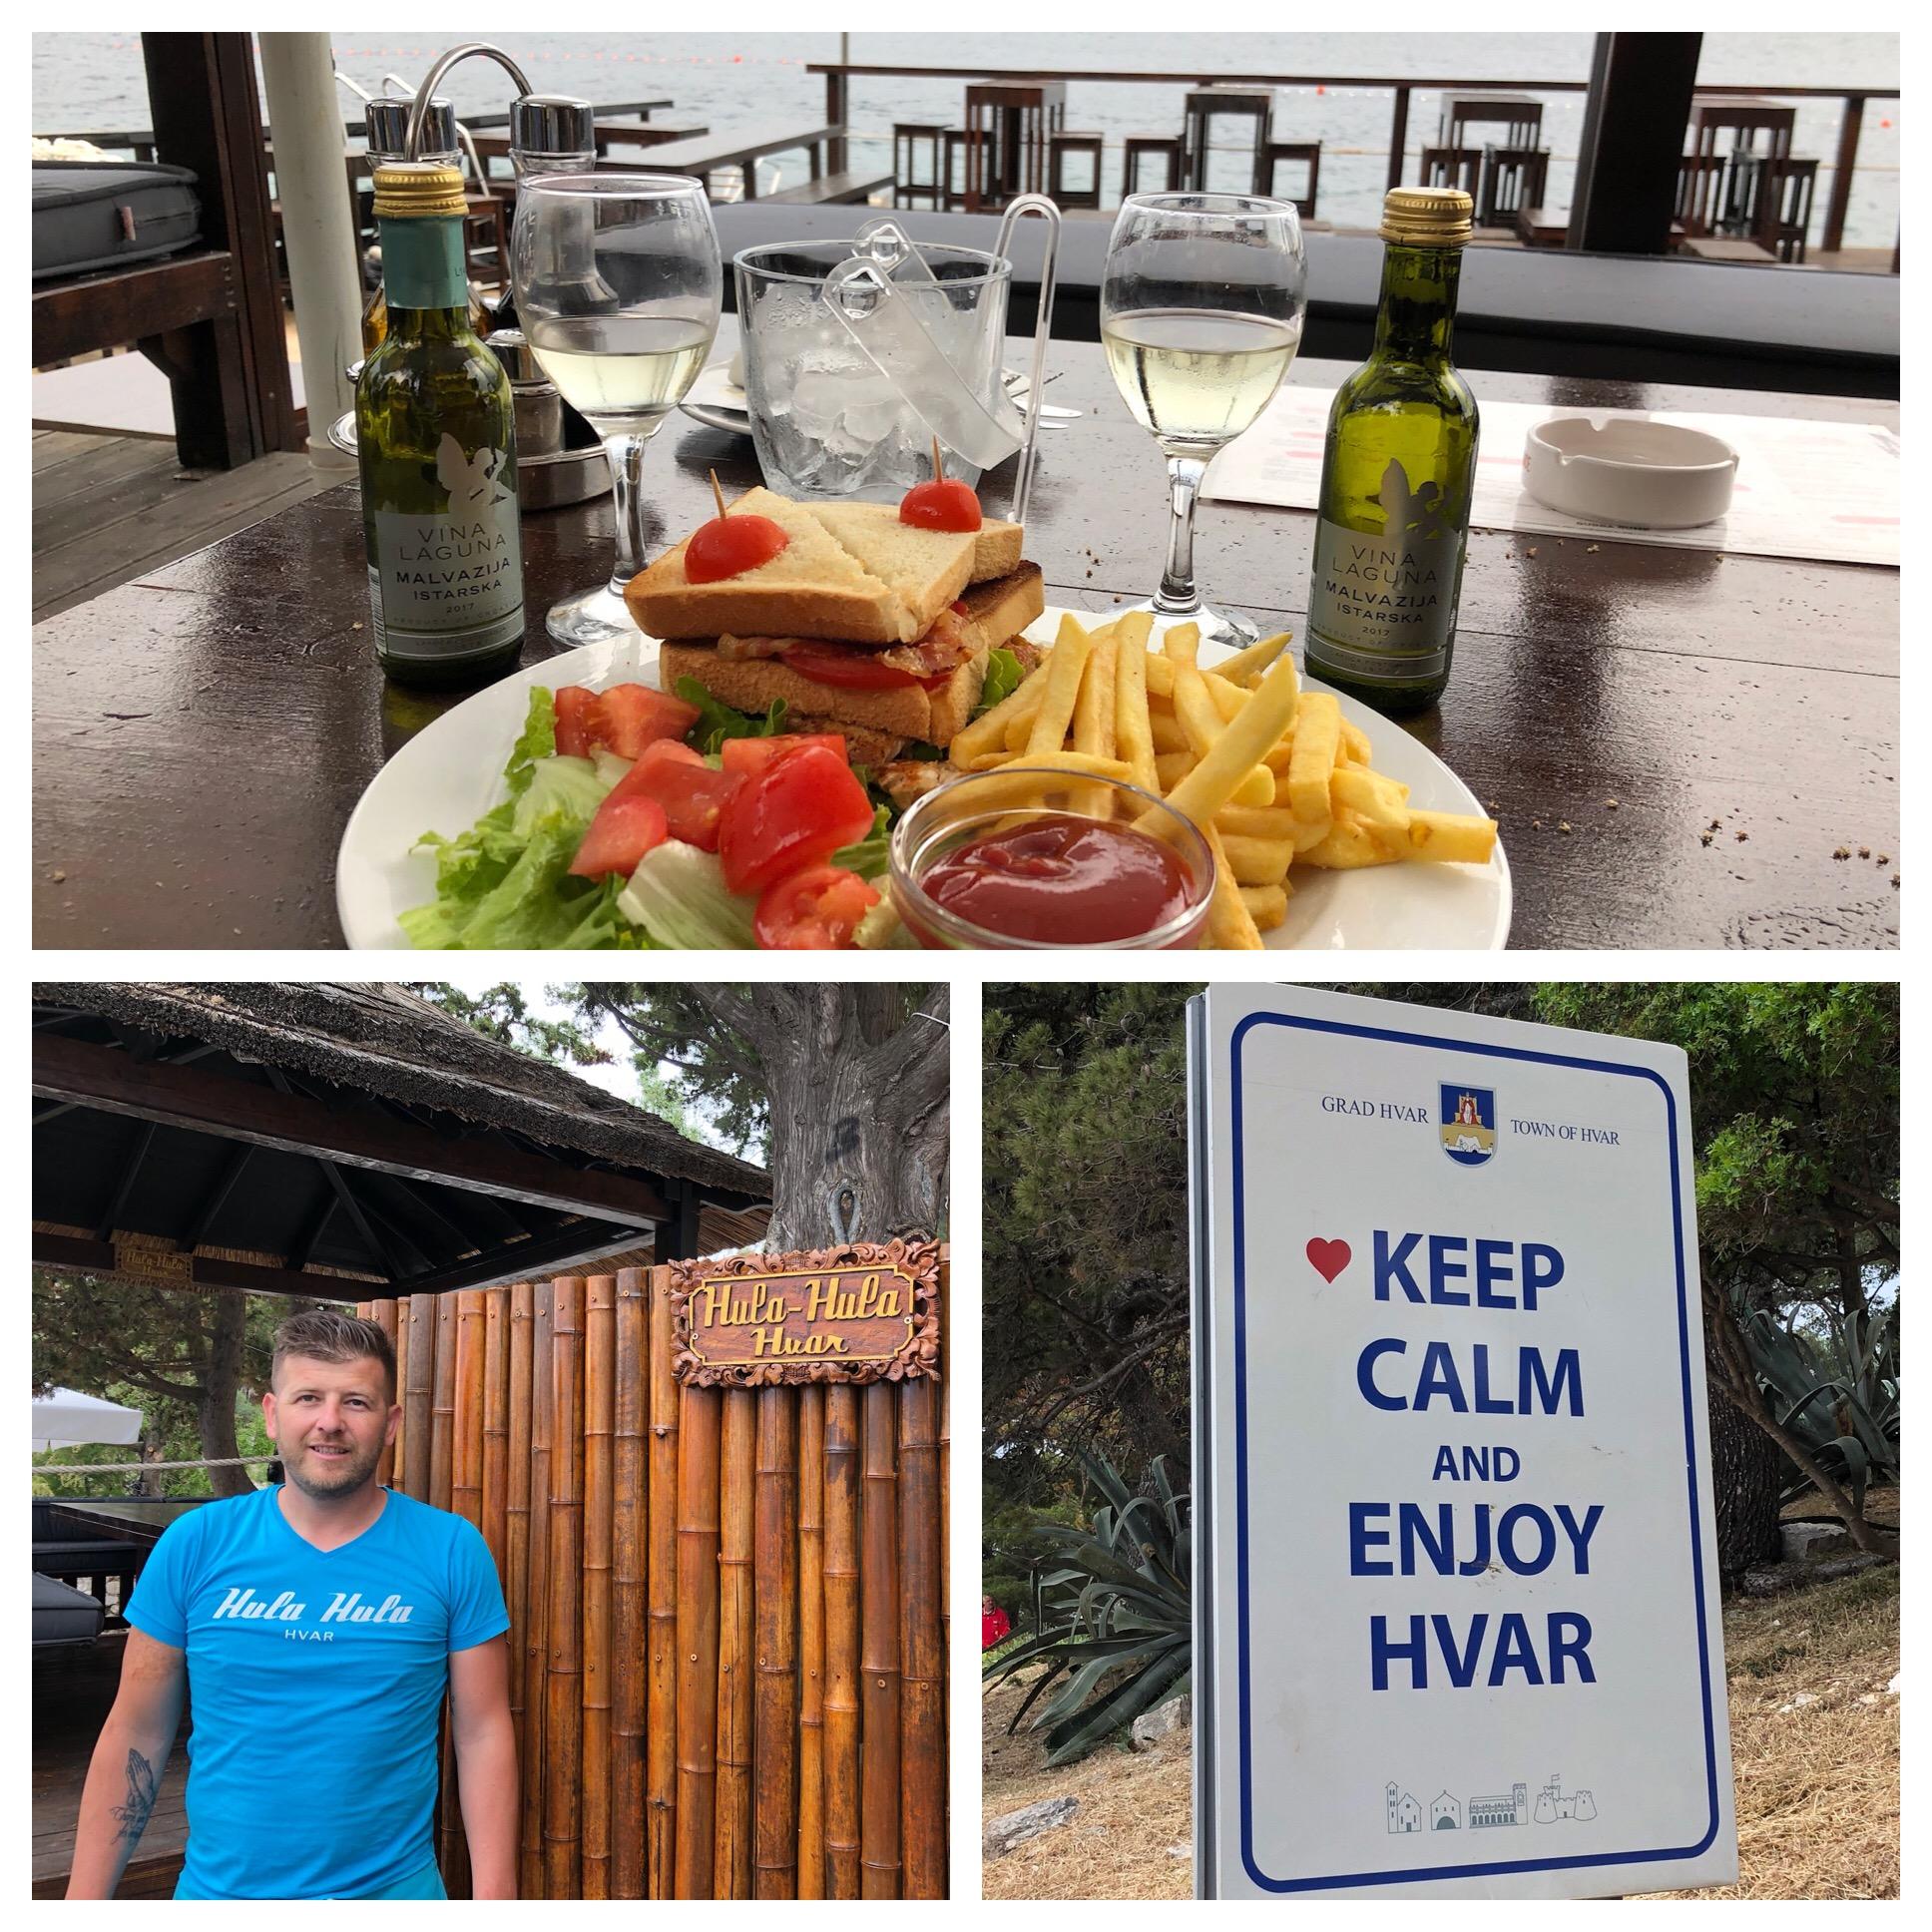 Our super nice waiter and love the Hvar sign!